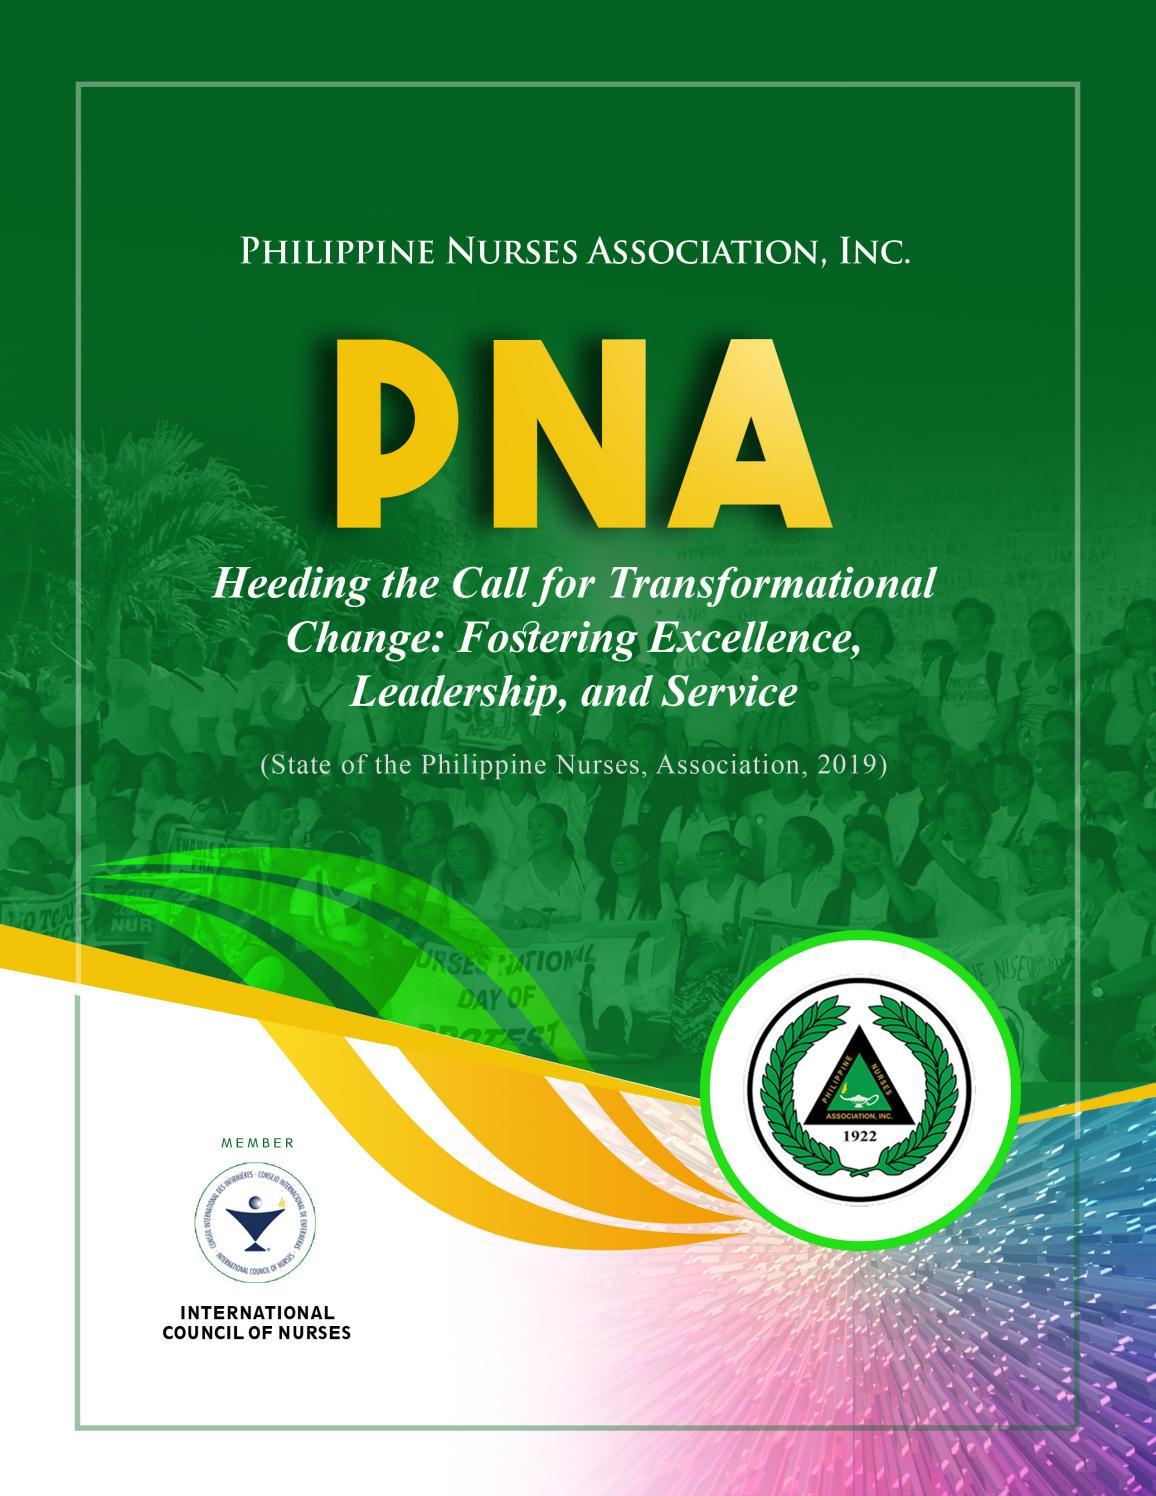 Pna Apo Report 2019 By Pna Cordillera Administrative Region Issuu